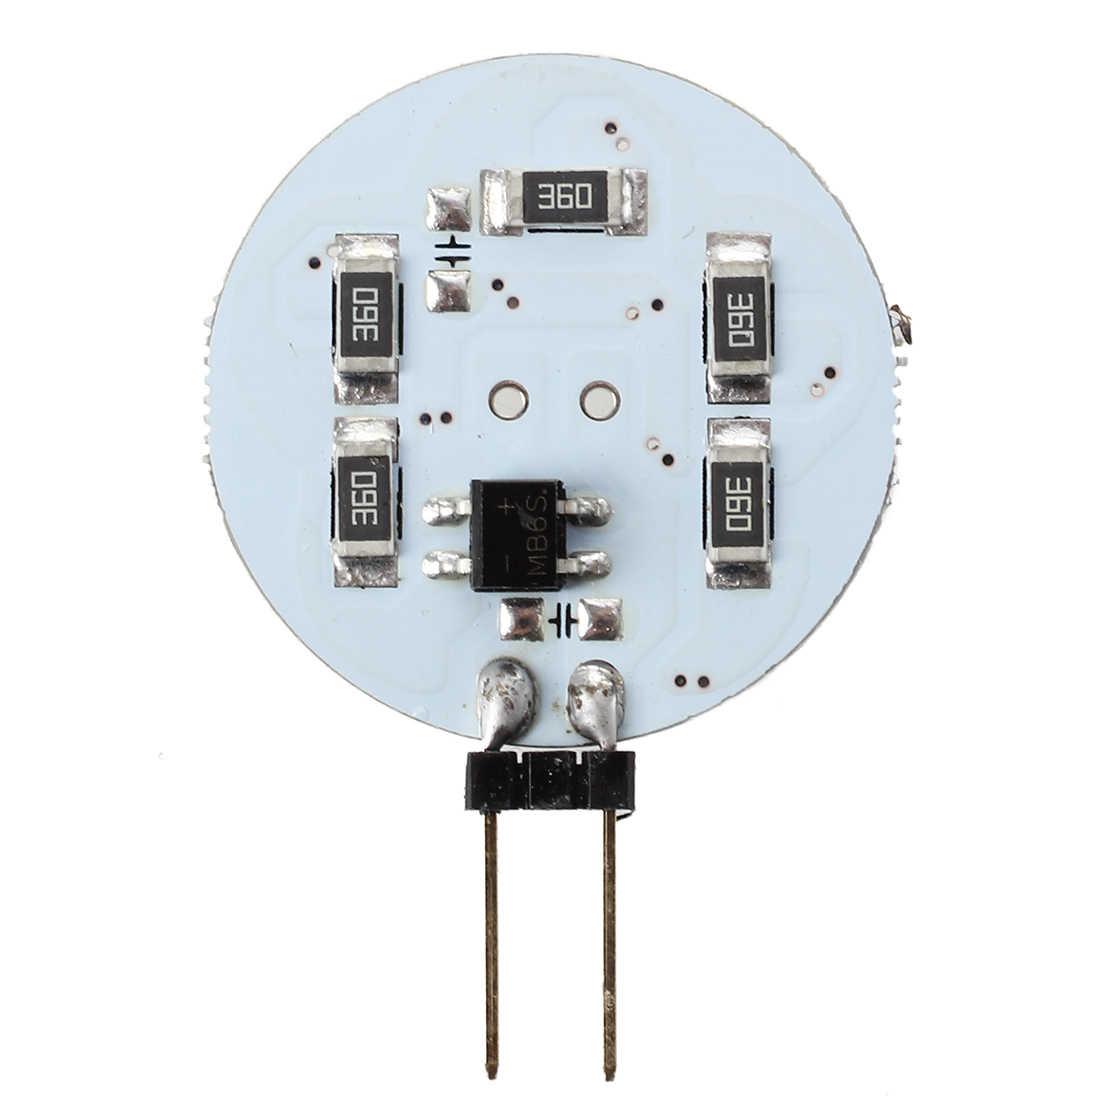 G4 SMD 5630 15 светодиодный 4W светильник ing лампа светильник Точечный светильник теплый белый